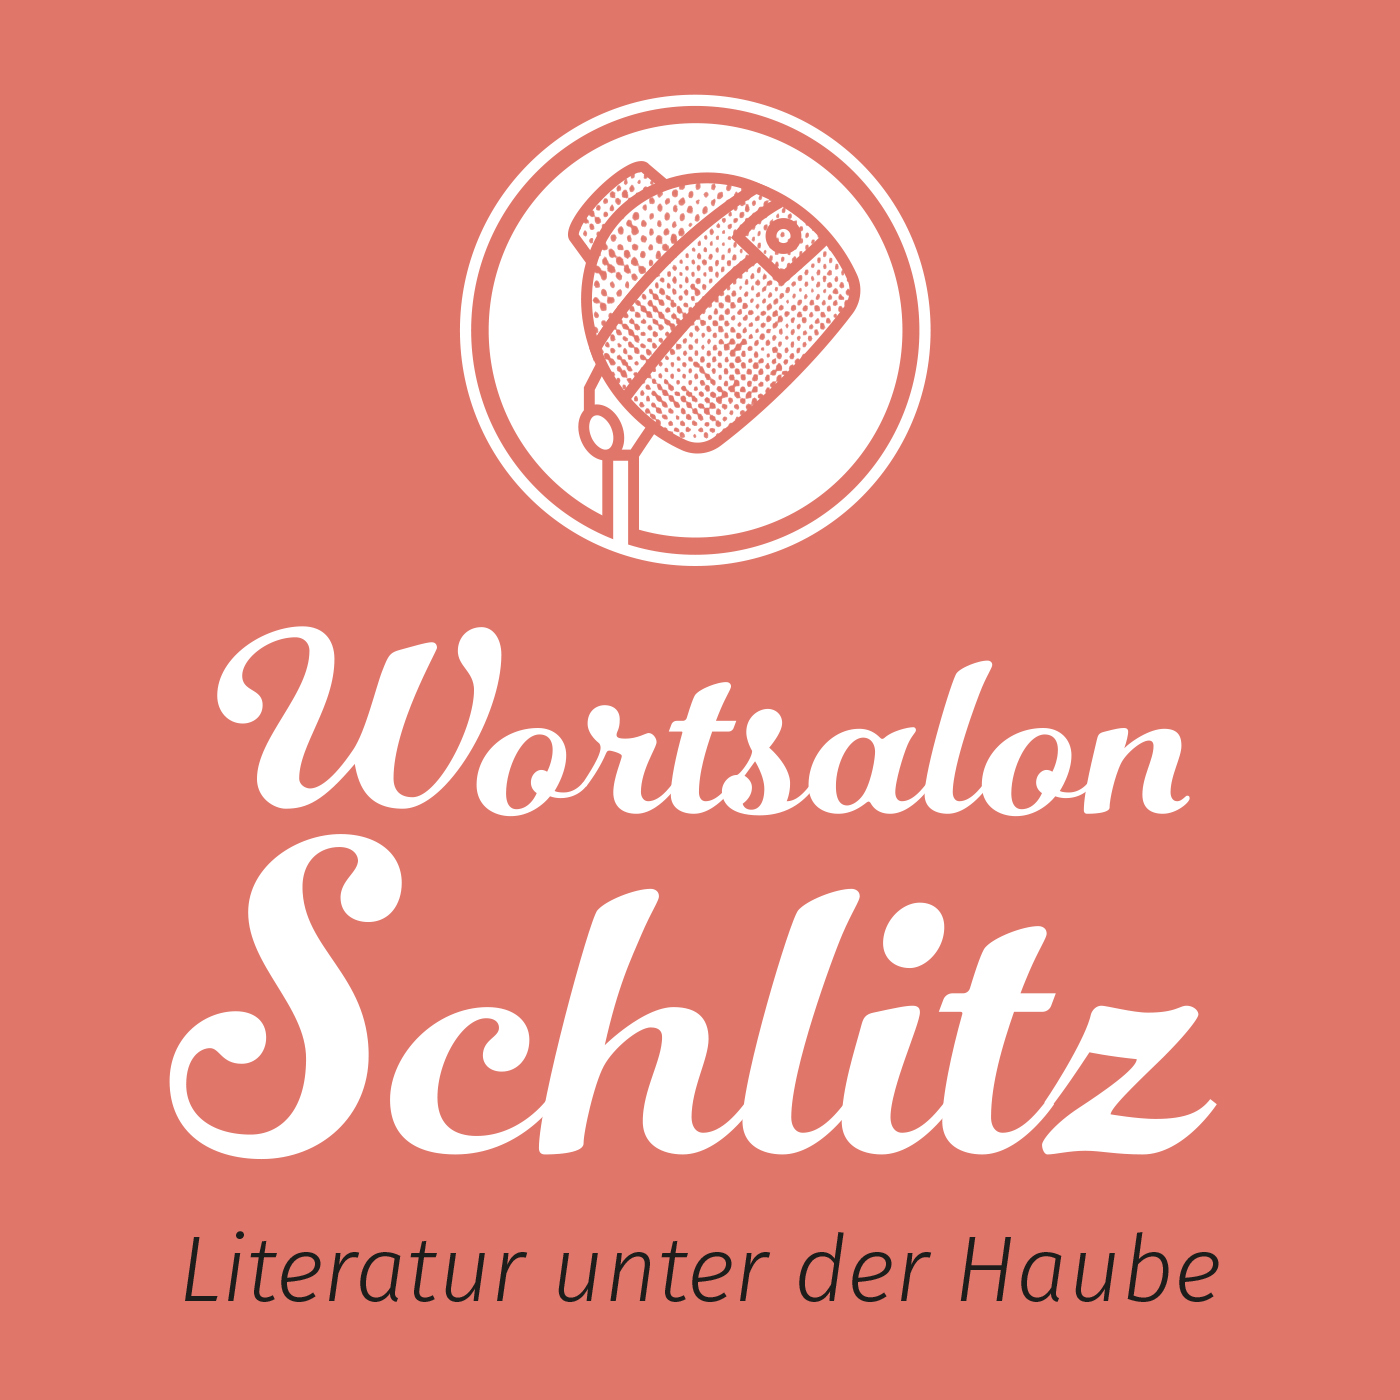 Neues Podcast Projekt – Wortsalon Schlitz